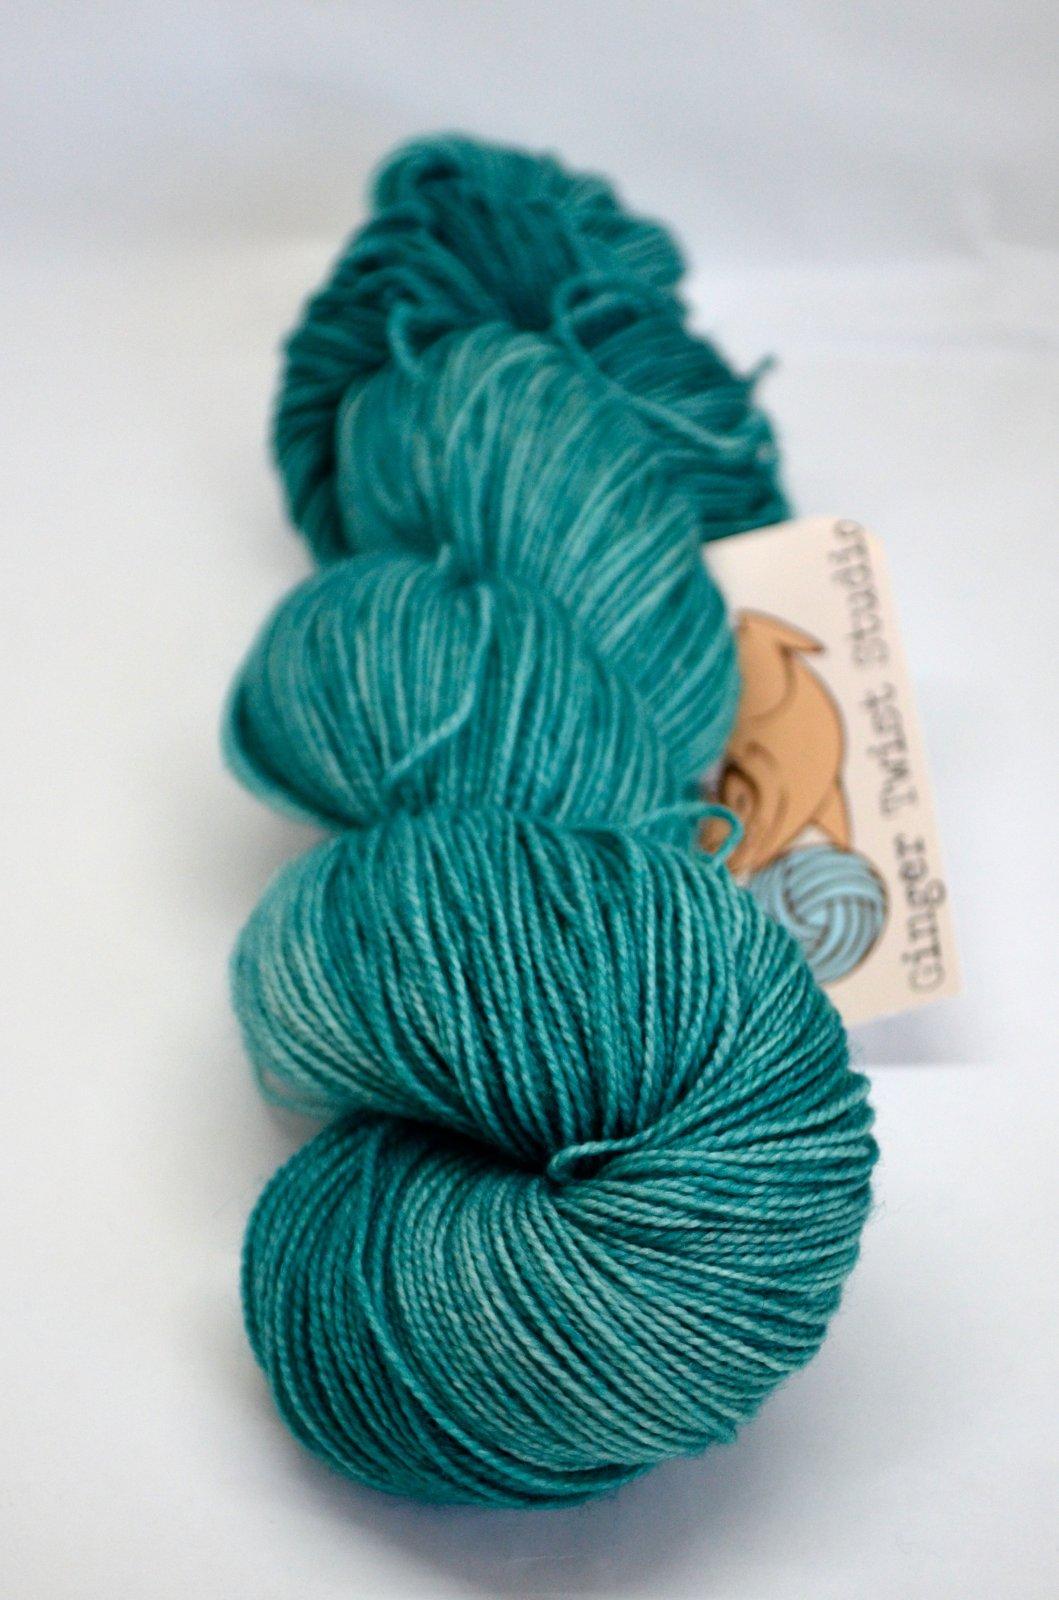 Ginger Twist Sheepish Sock